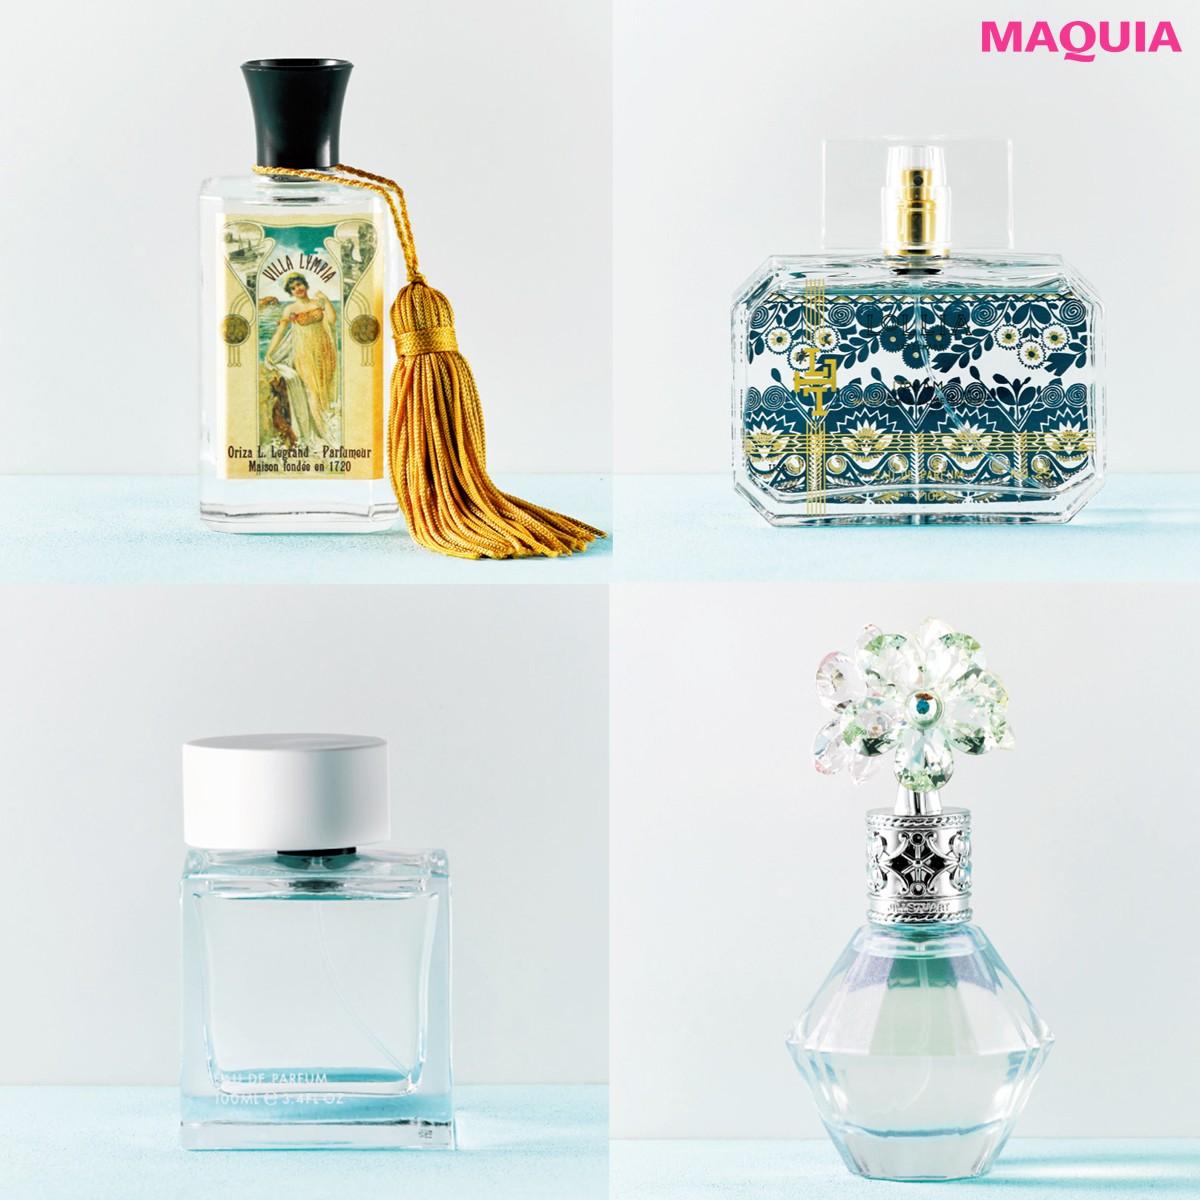 【JILL STUART・LOLLIA etc.】透き通るような香りに包まれて透明感のある女性に!